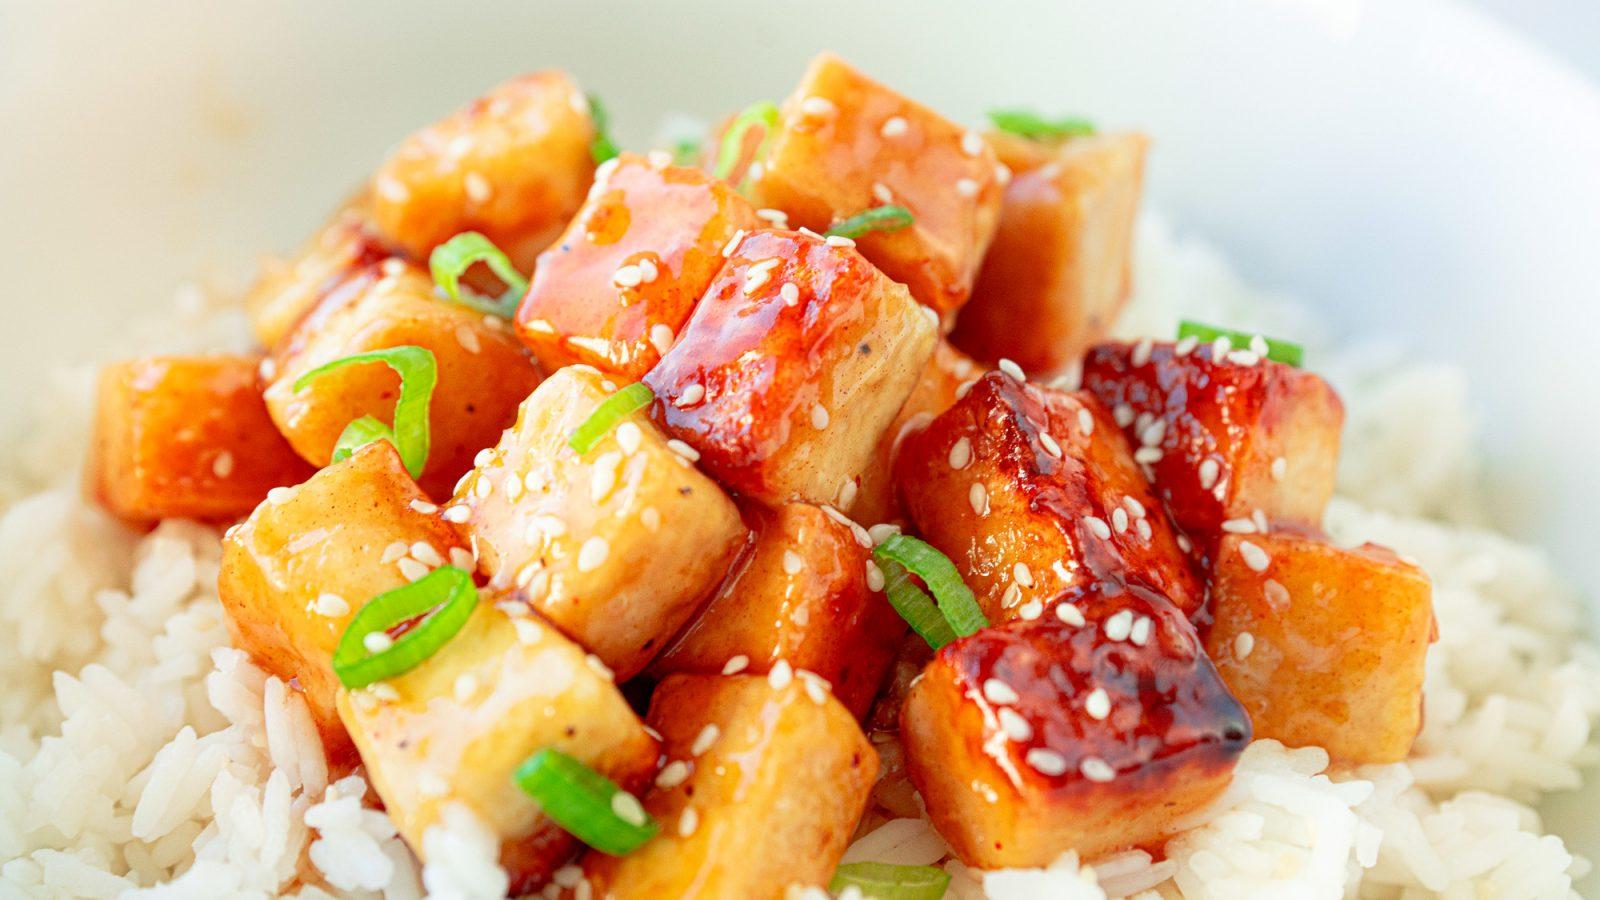 vegan orange tofu over white rice